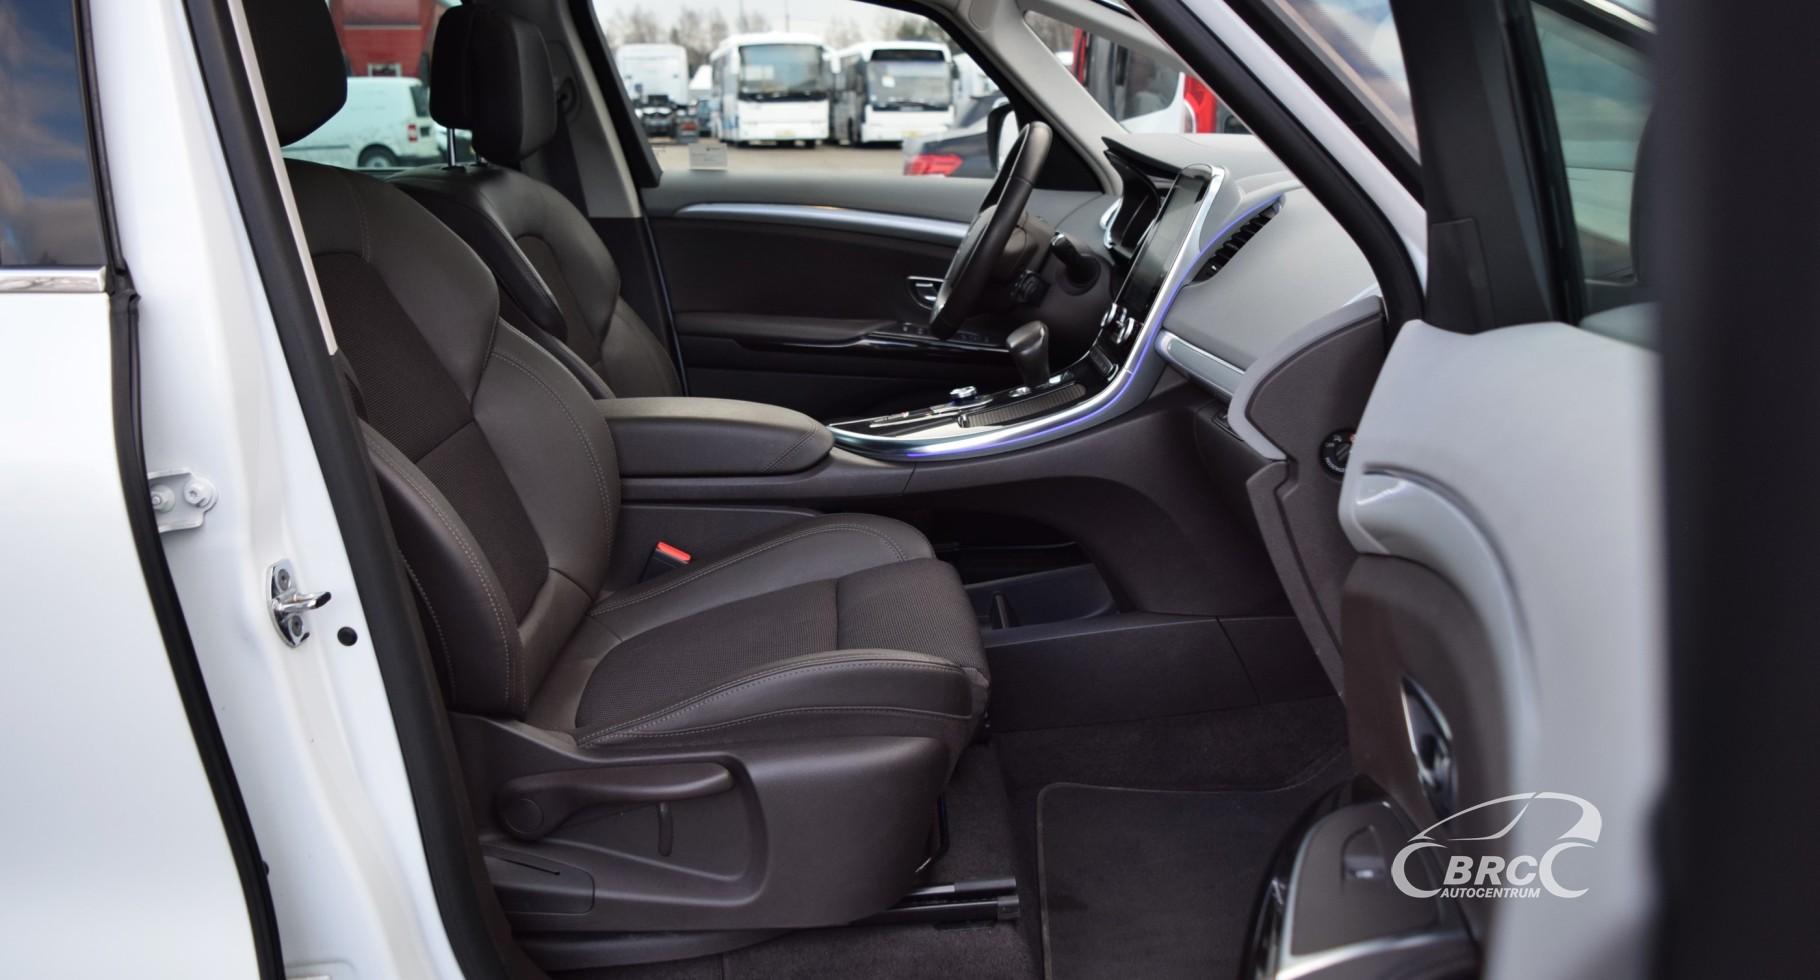 Renault Espace 7 seats